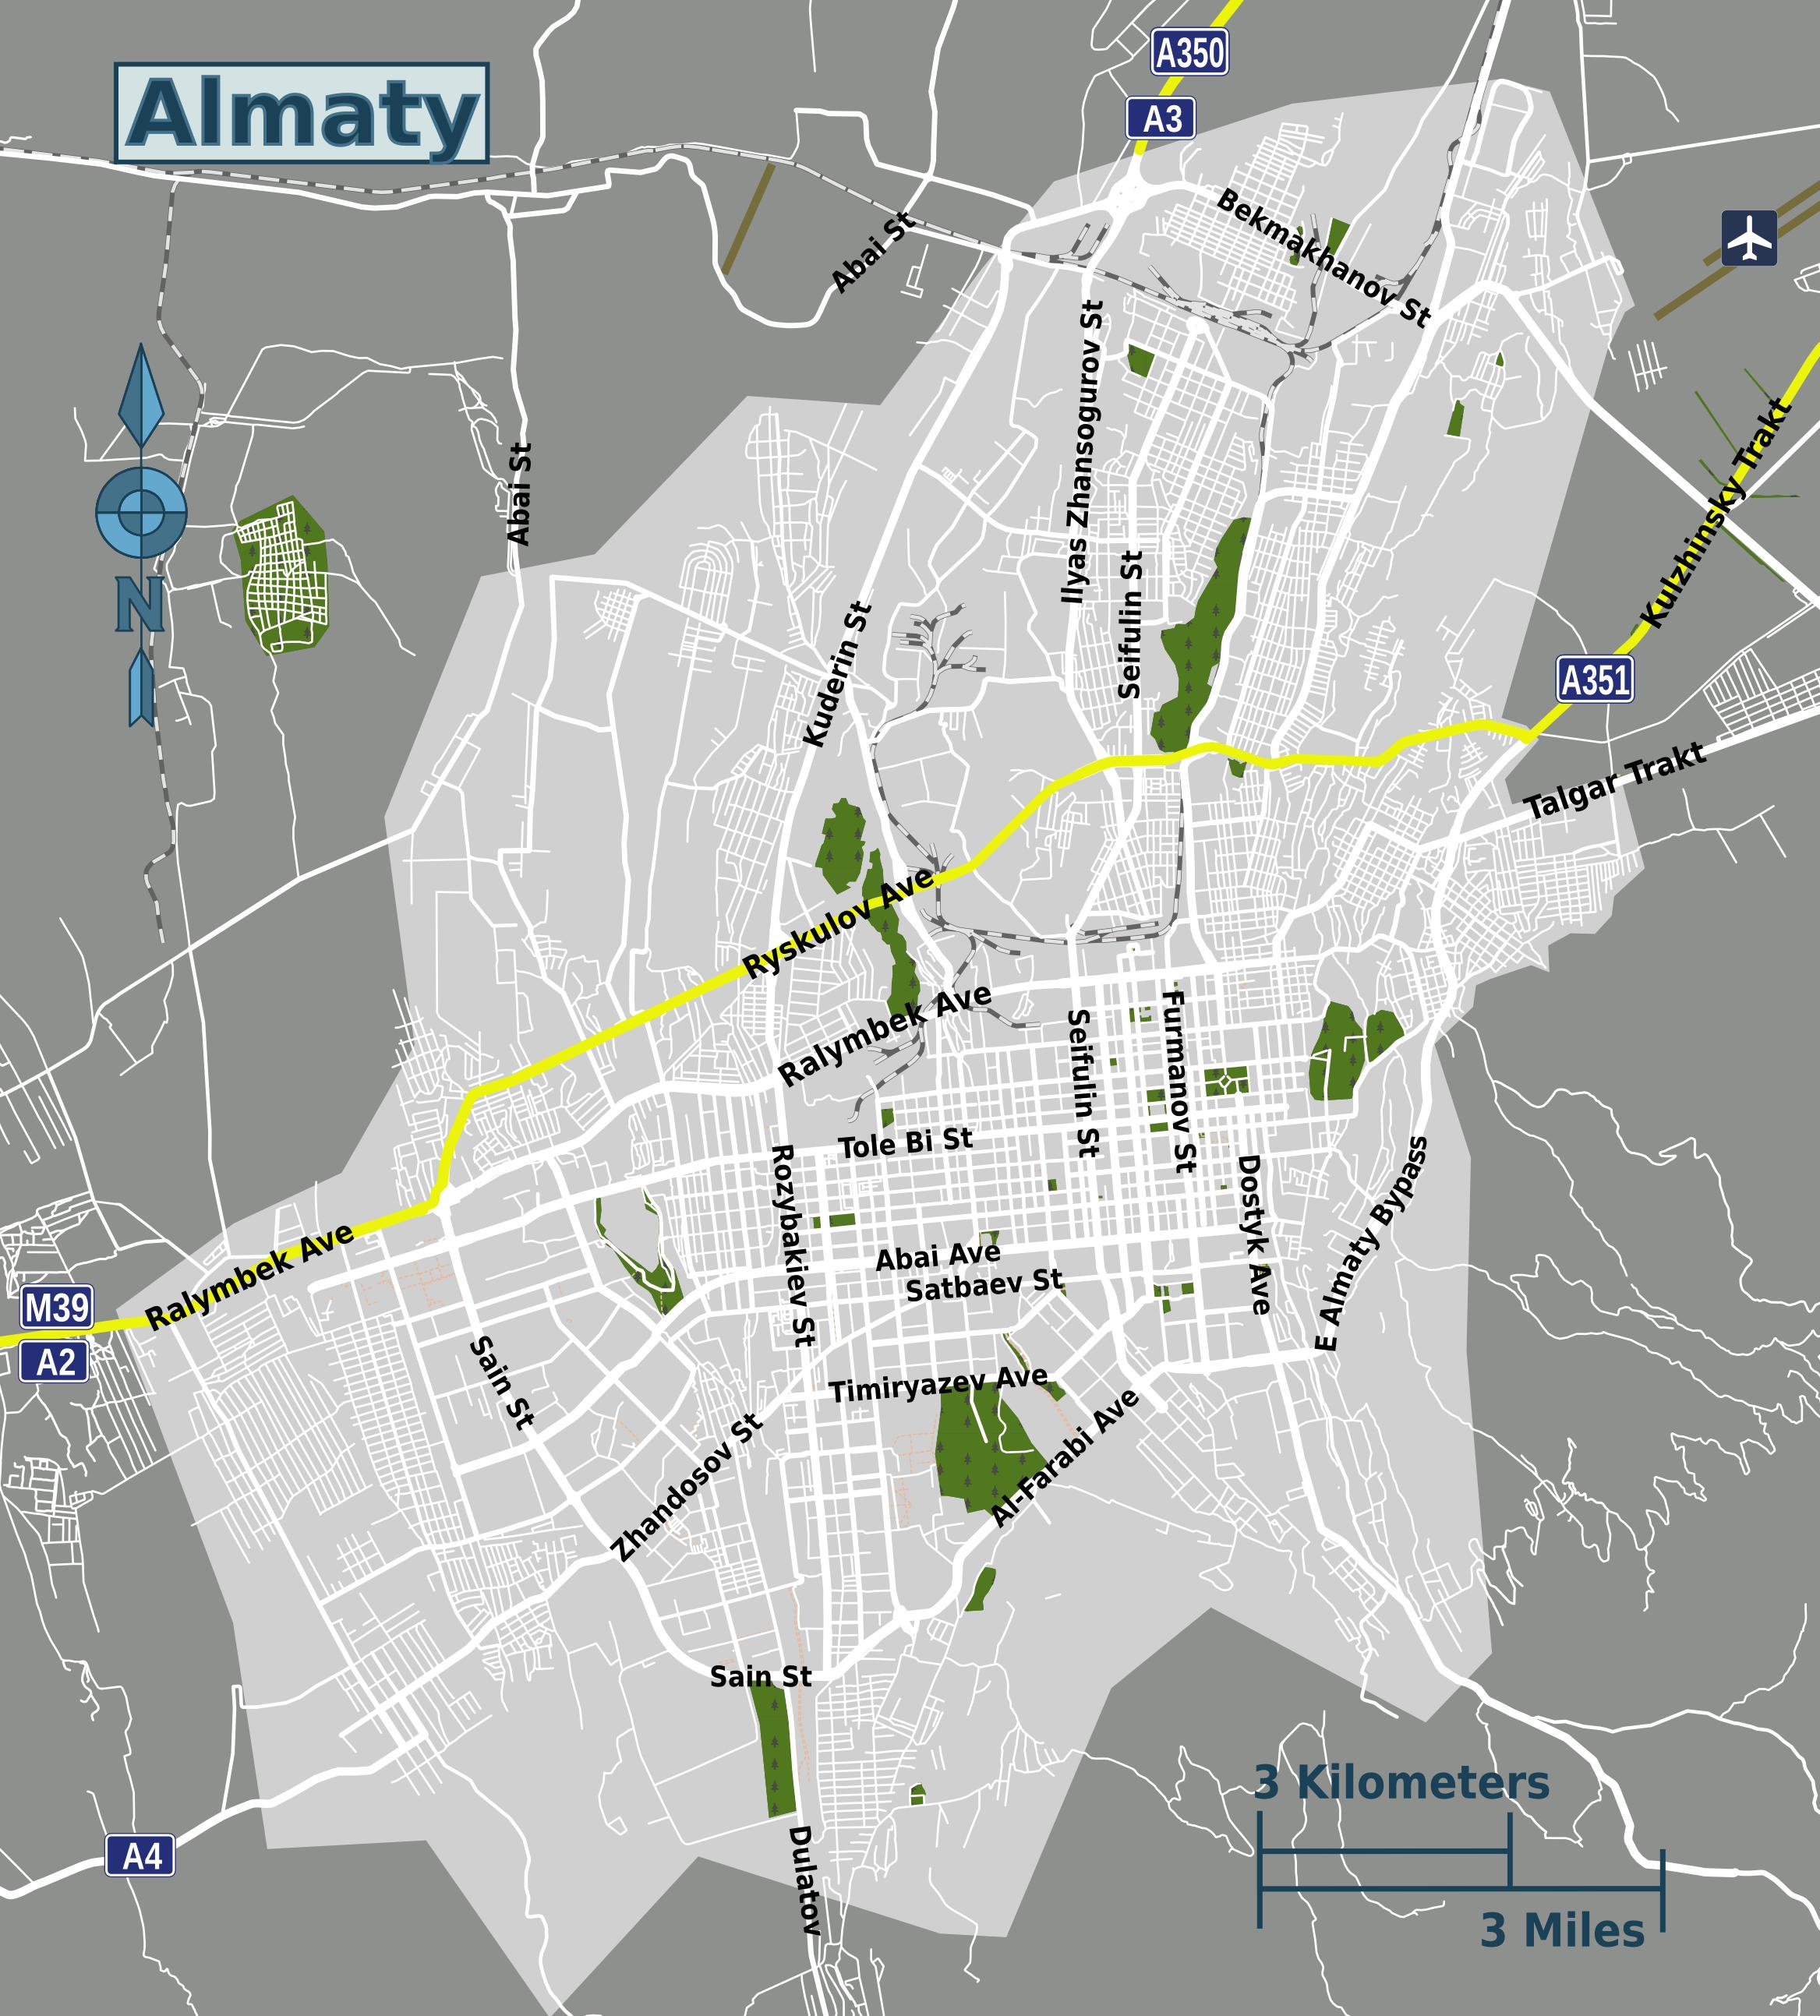 FileAlmaty mappng Wikimedia Commons